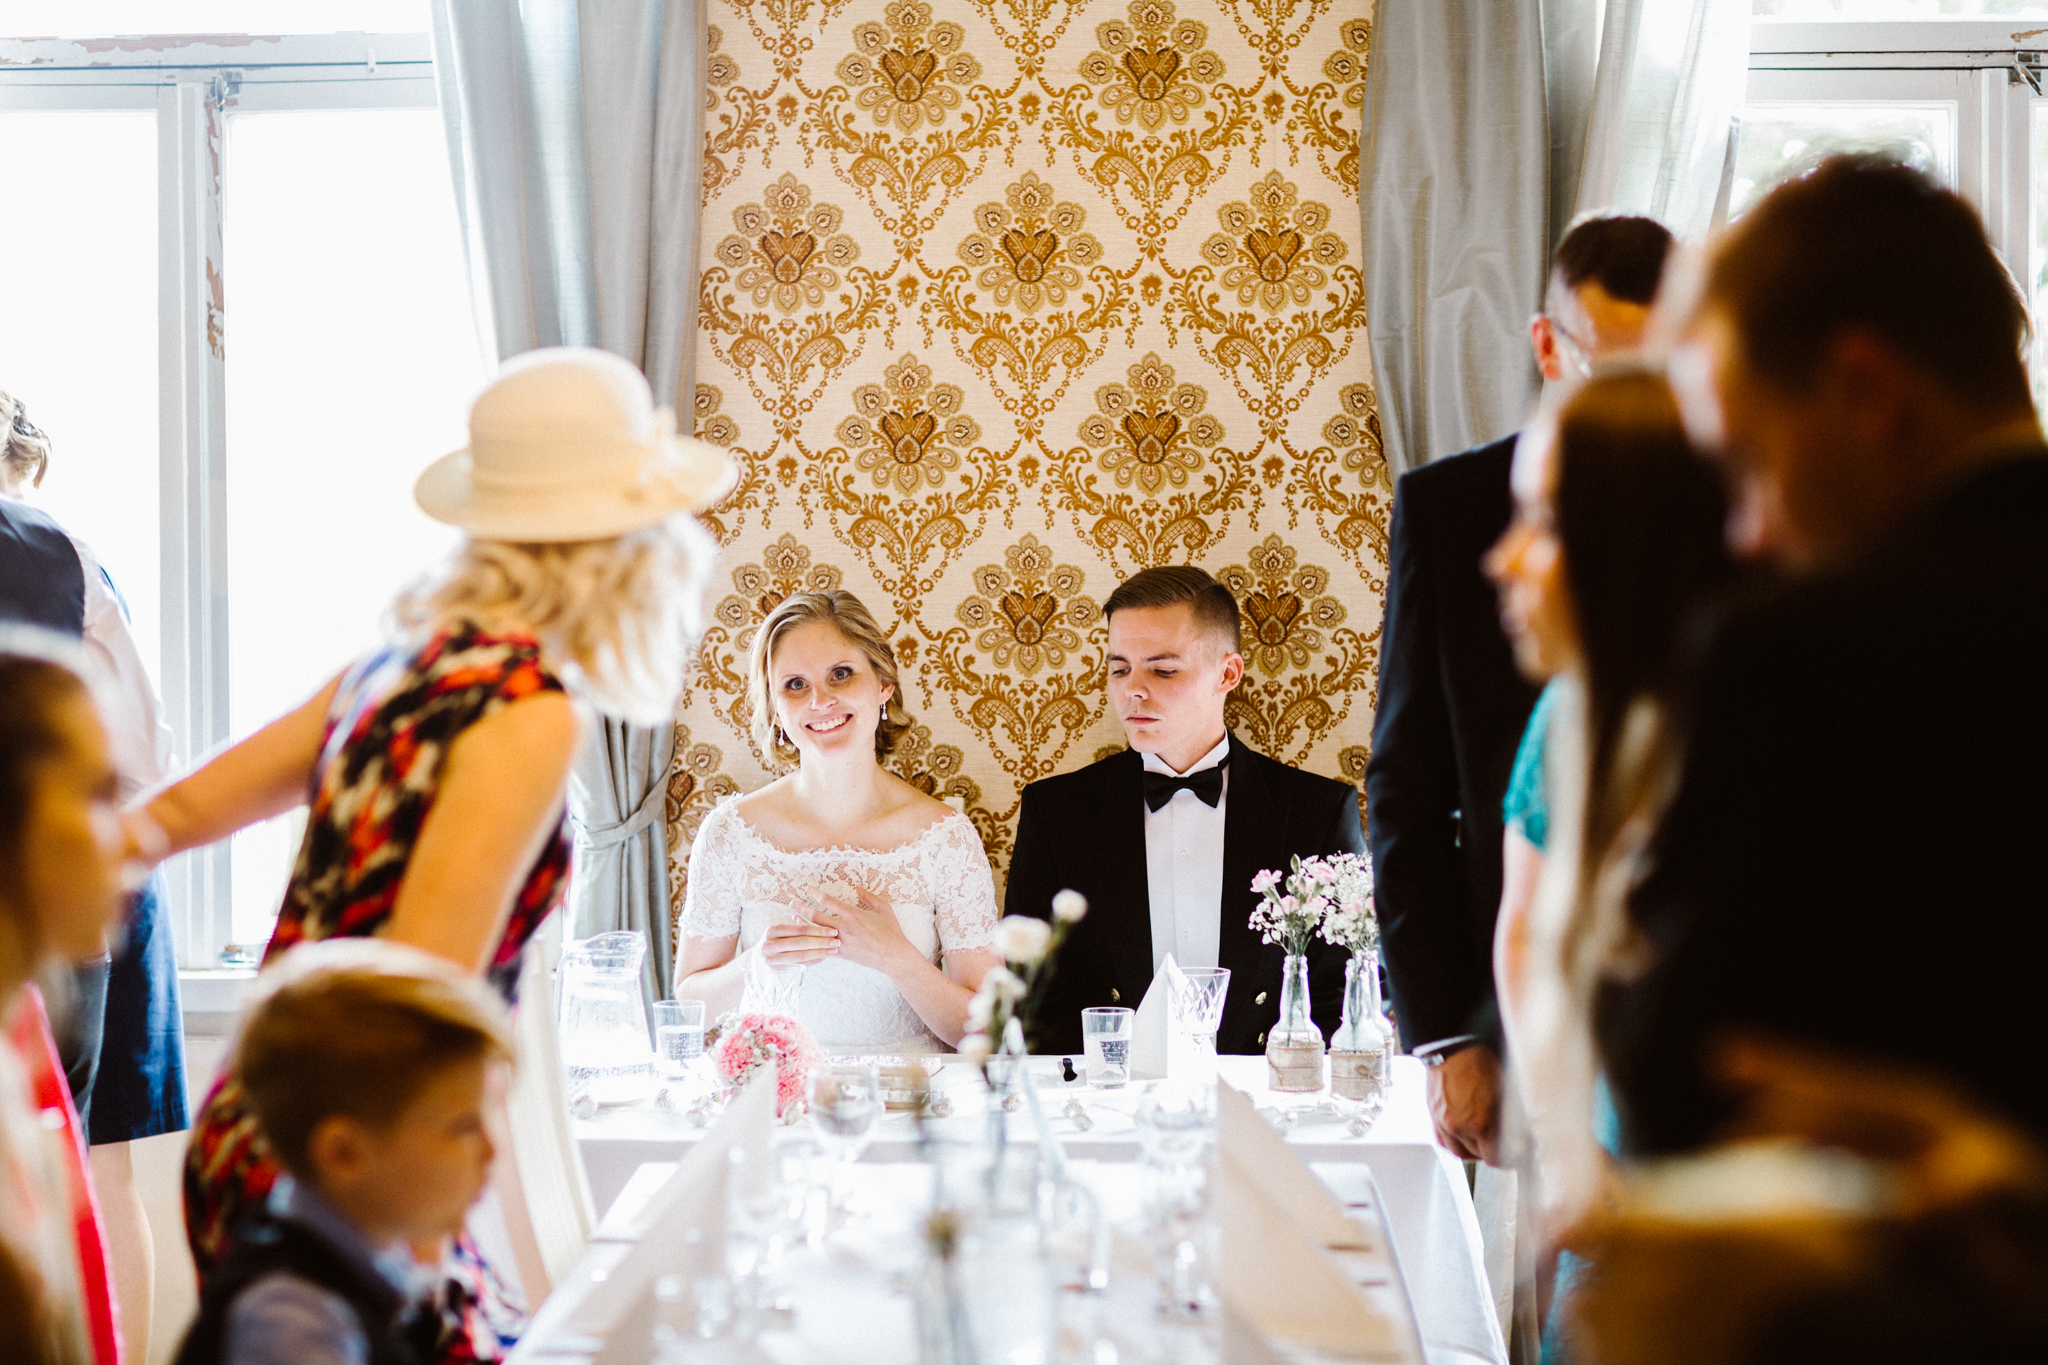 Pinja + Marko -- Patrick Karkkolainen Wedding Photographer-135.jpg